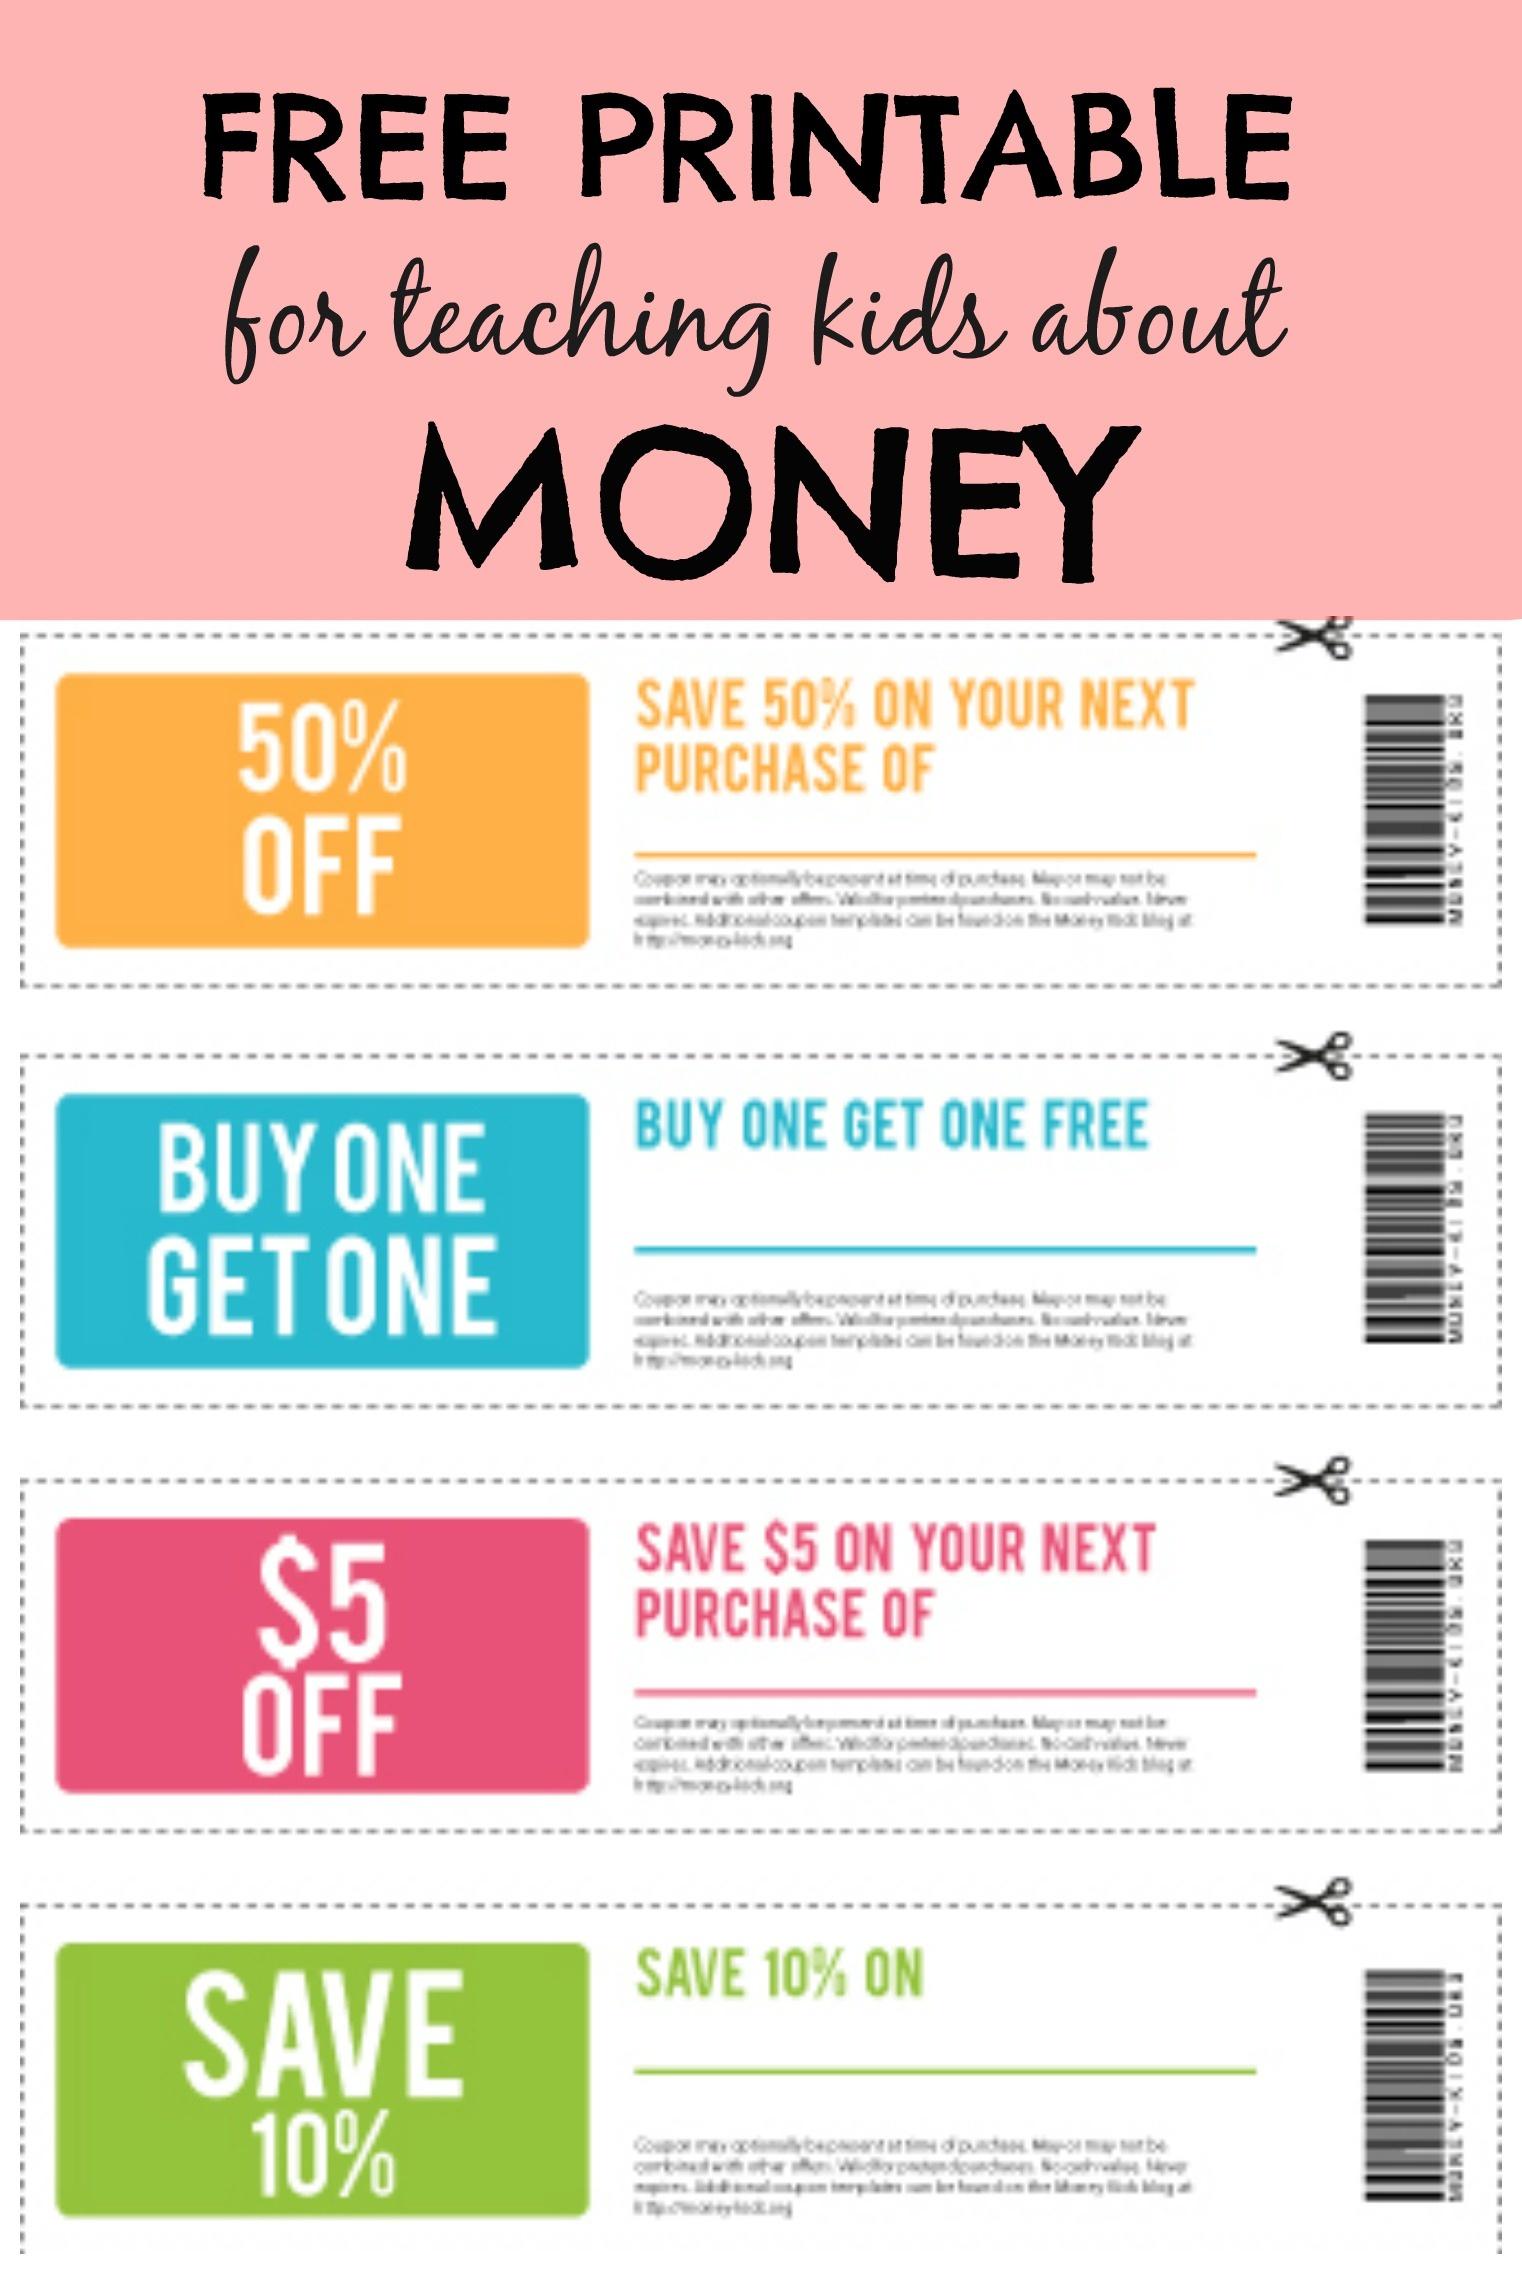 Money Kids: Free Printable & Budgeting Activity - United Moms Network - Free Printable Money For Kids